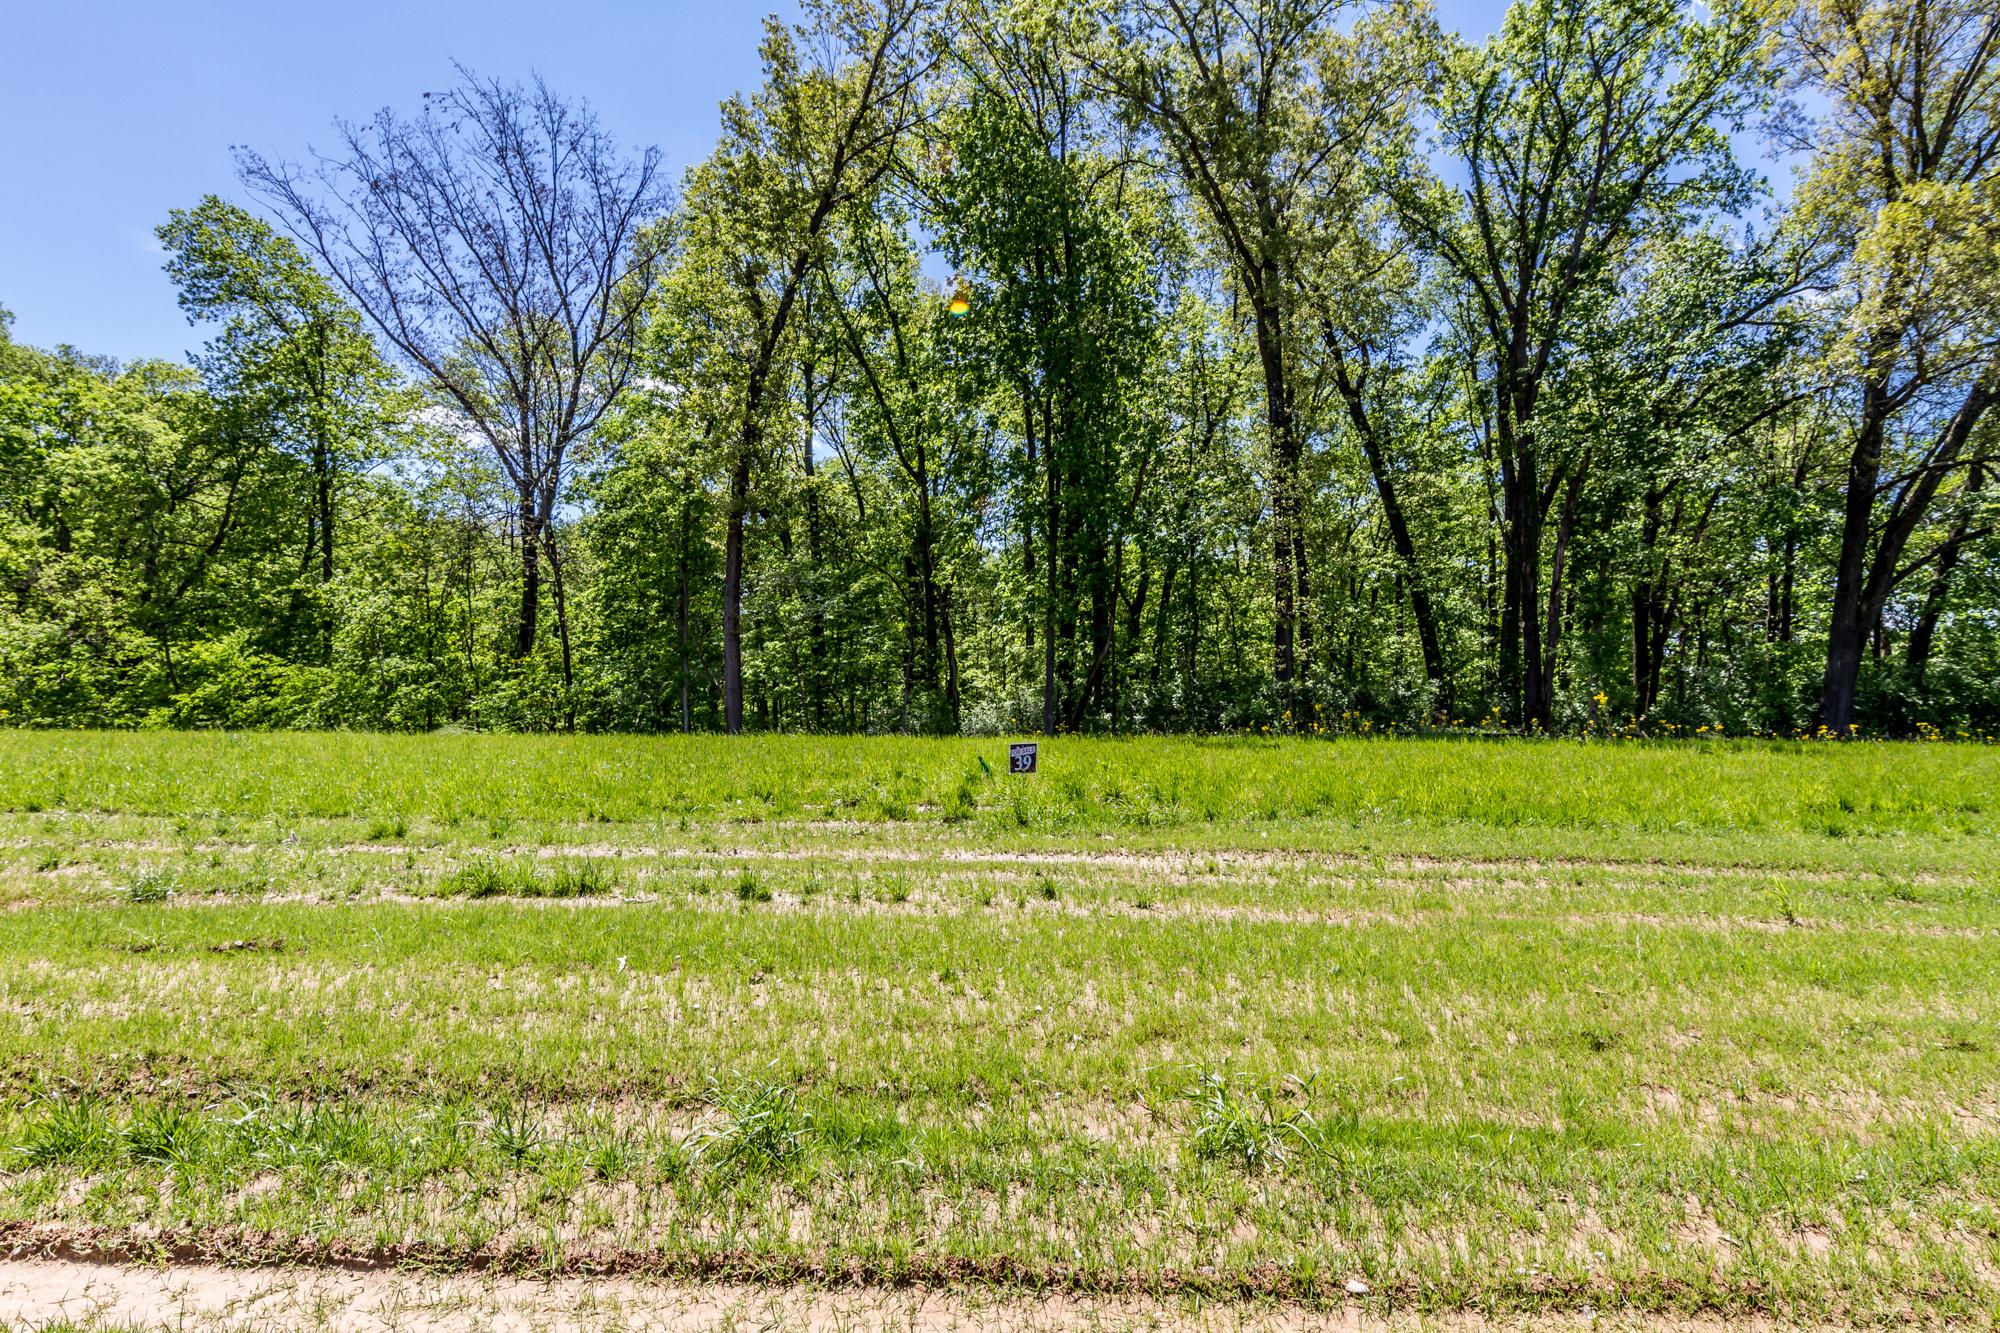 Bethel_Ridge_Farms_O'Fallon_Illinois_Progress_5.3.17-3.jpg